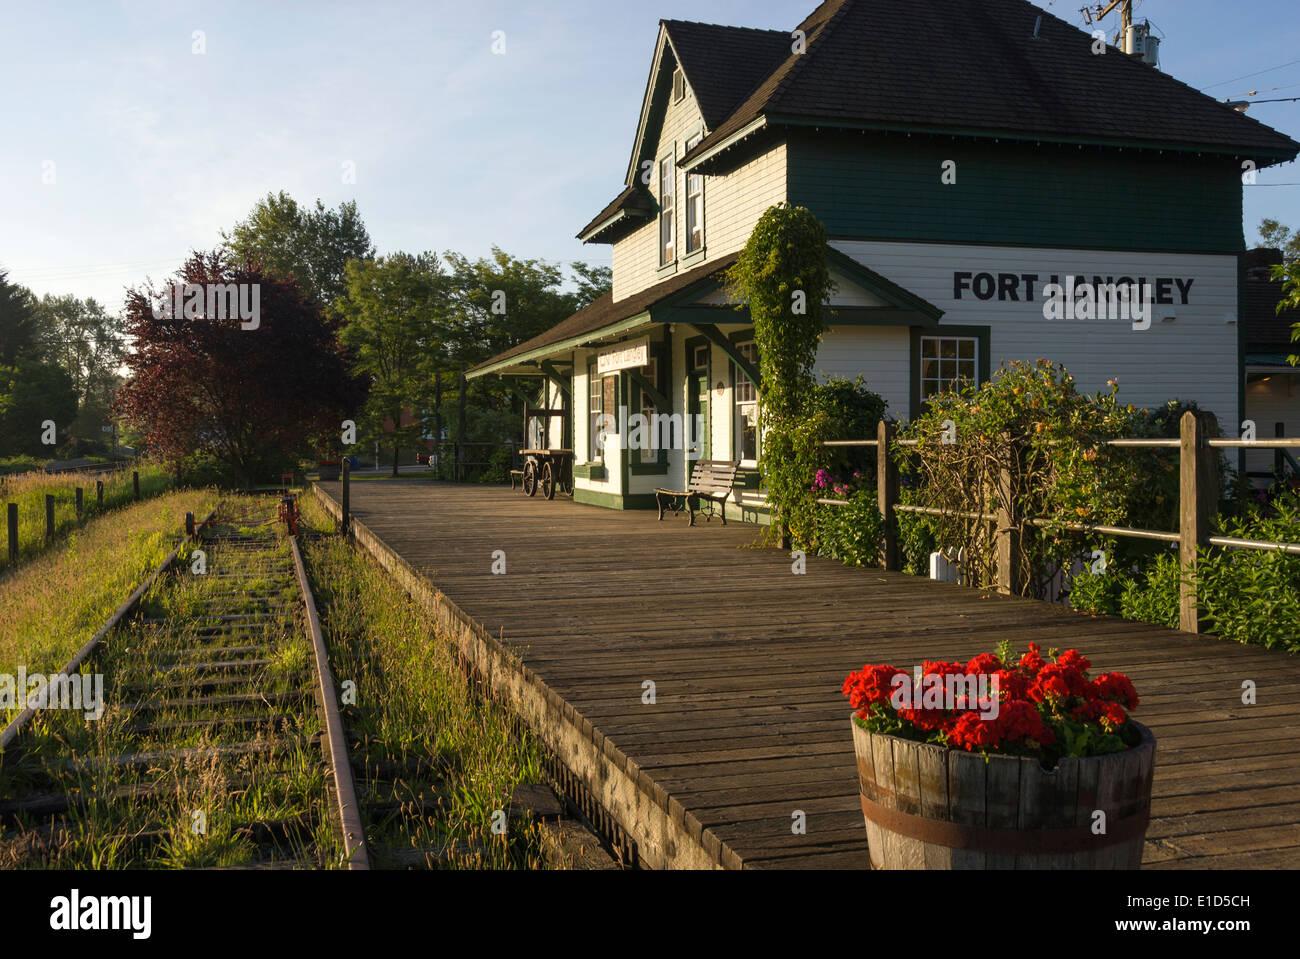 Elk203-1347 Canada, British Columbia, Fort Langley, train station - Stock Image